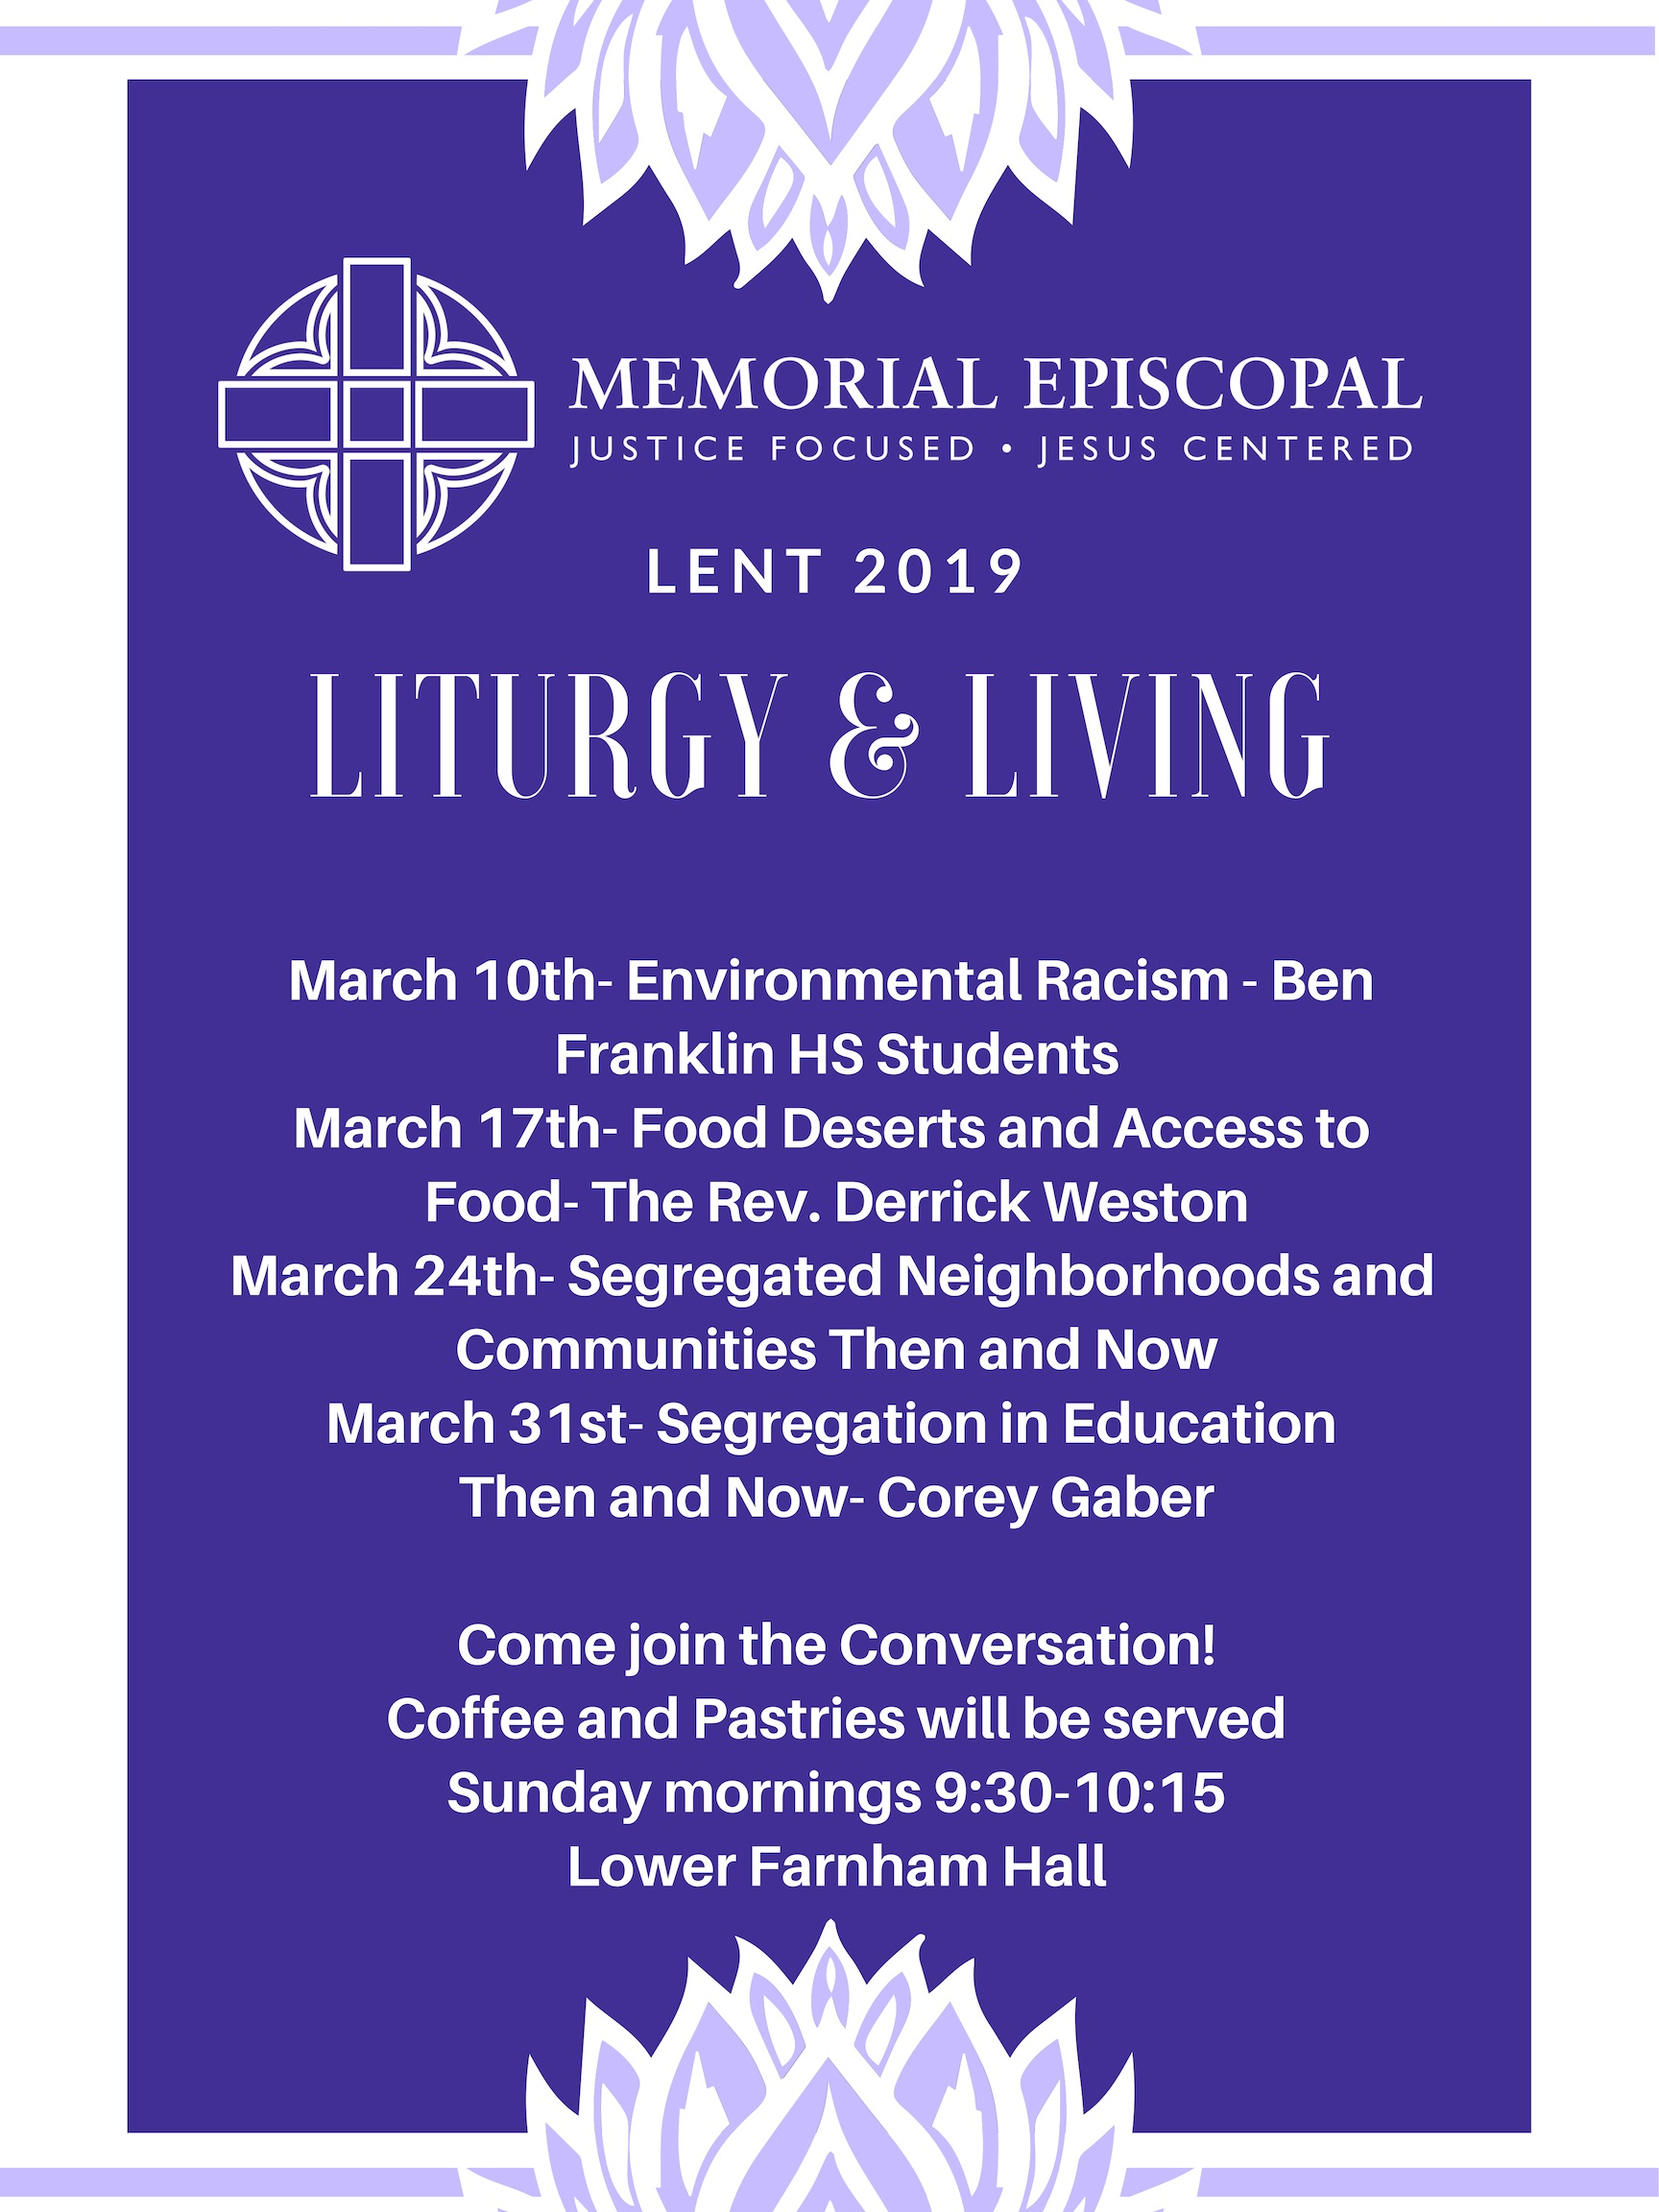 Liturgy and Living Lent 2019 REVISED.jpg